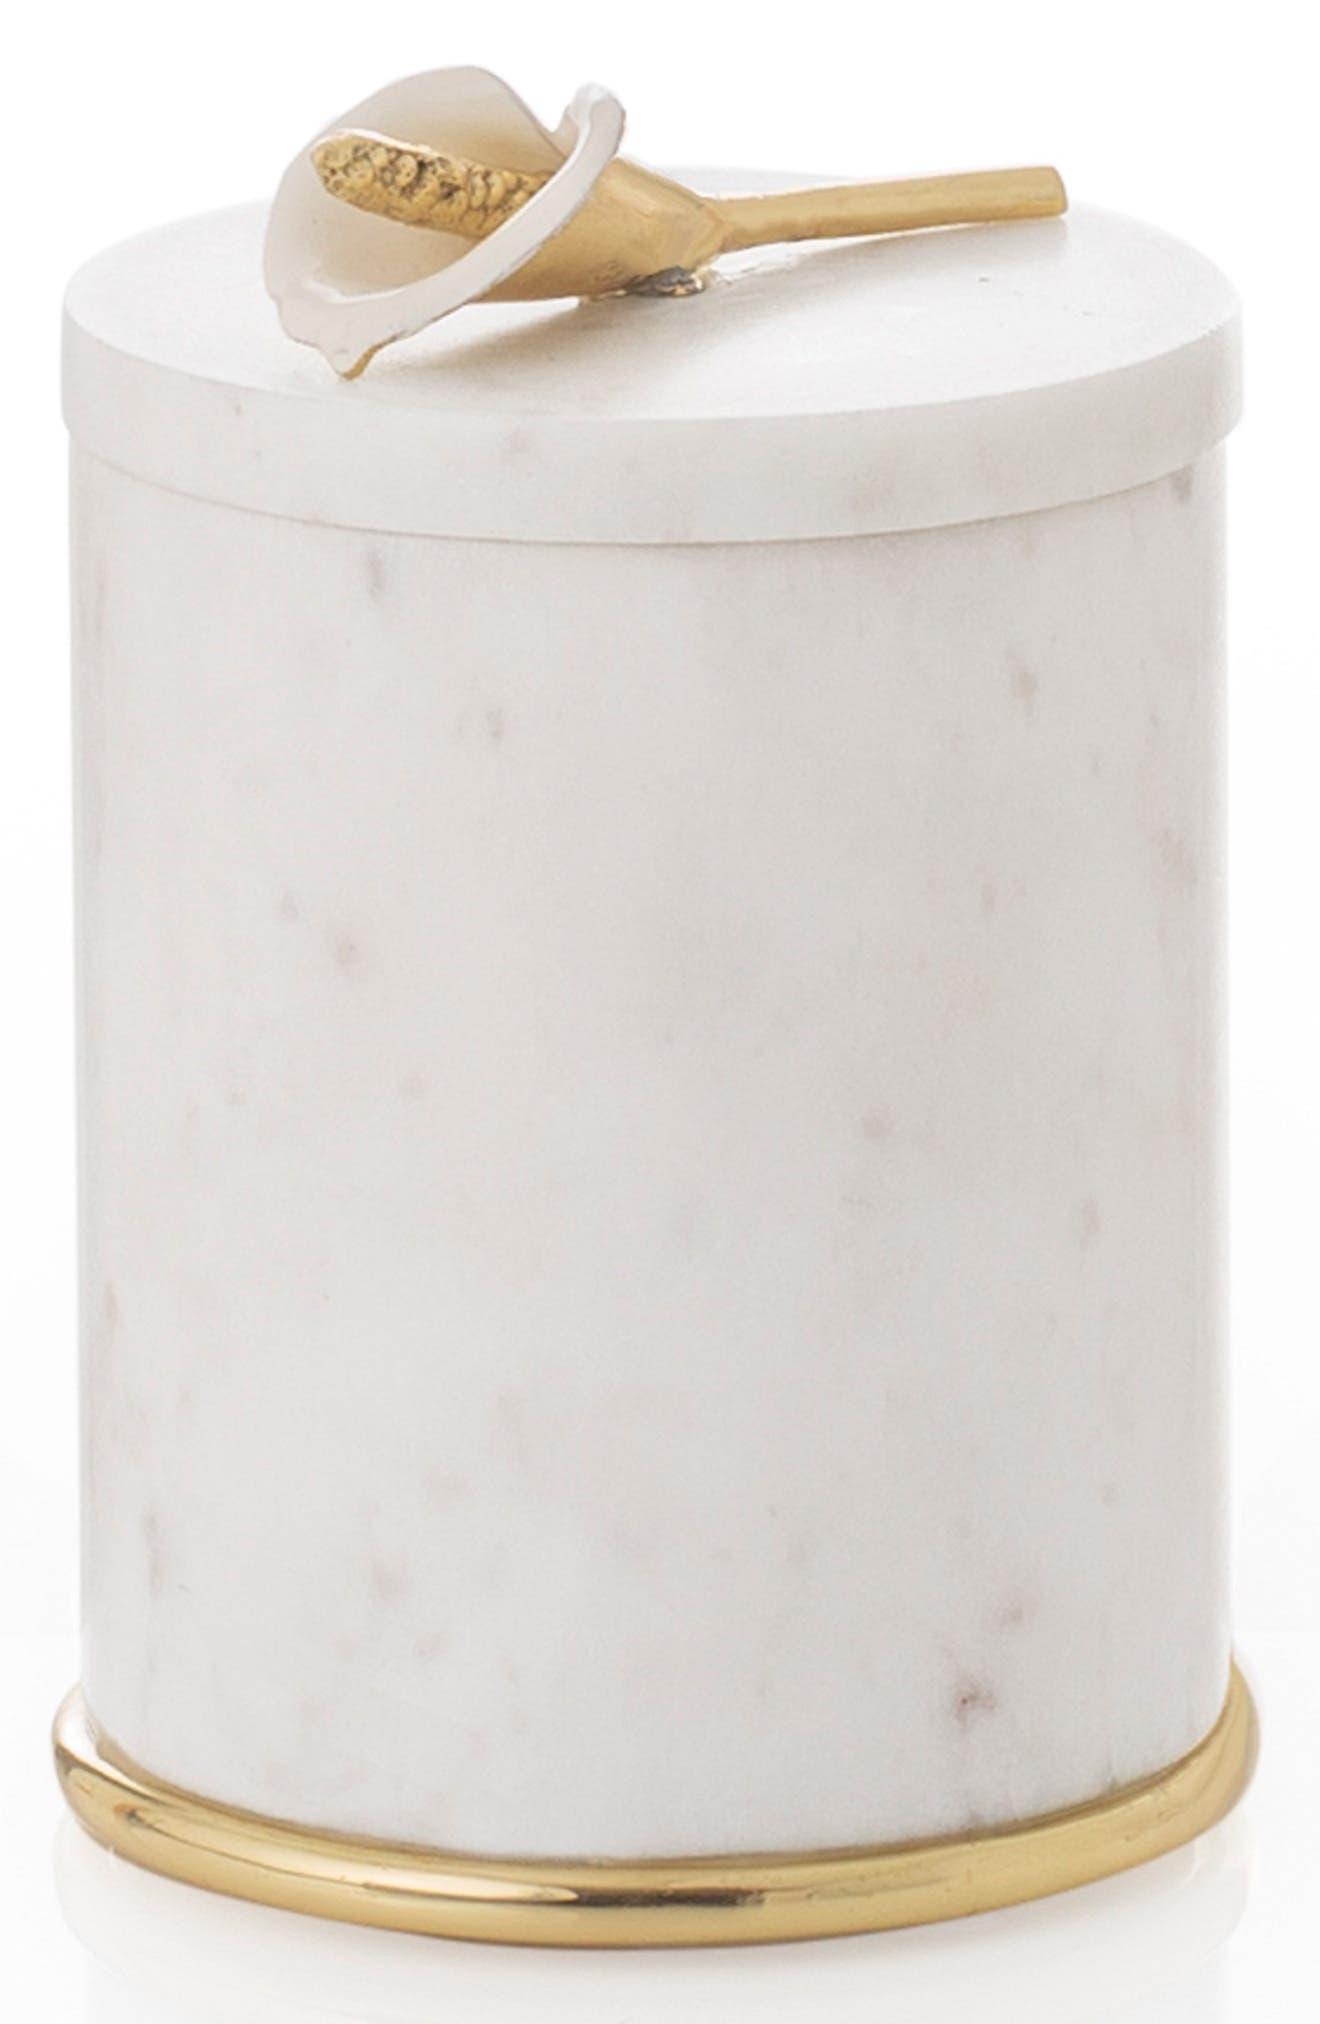 MICHAEL ARAM Calla Lily Round Marble Container, Main, color, WHITE